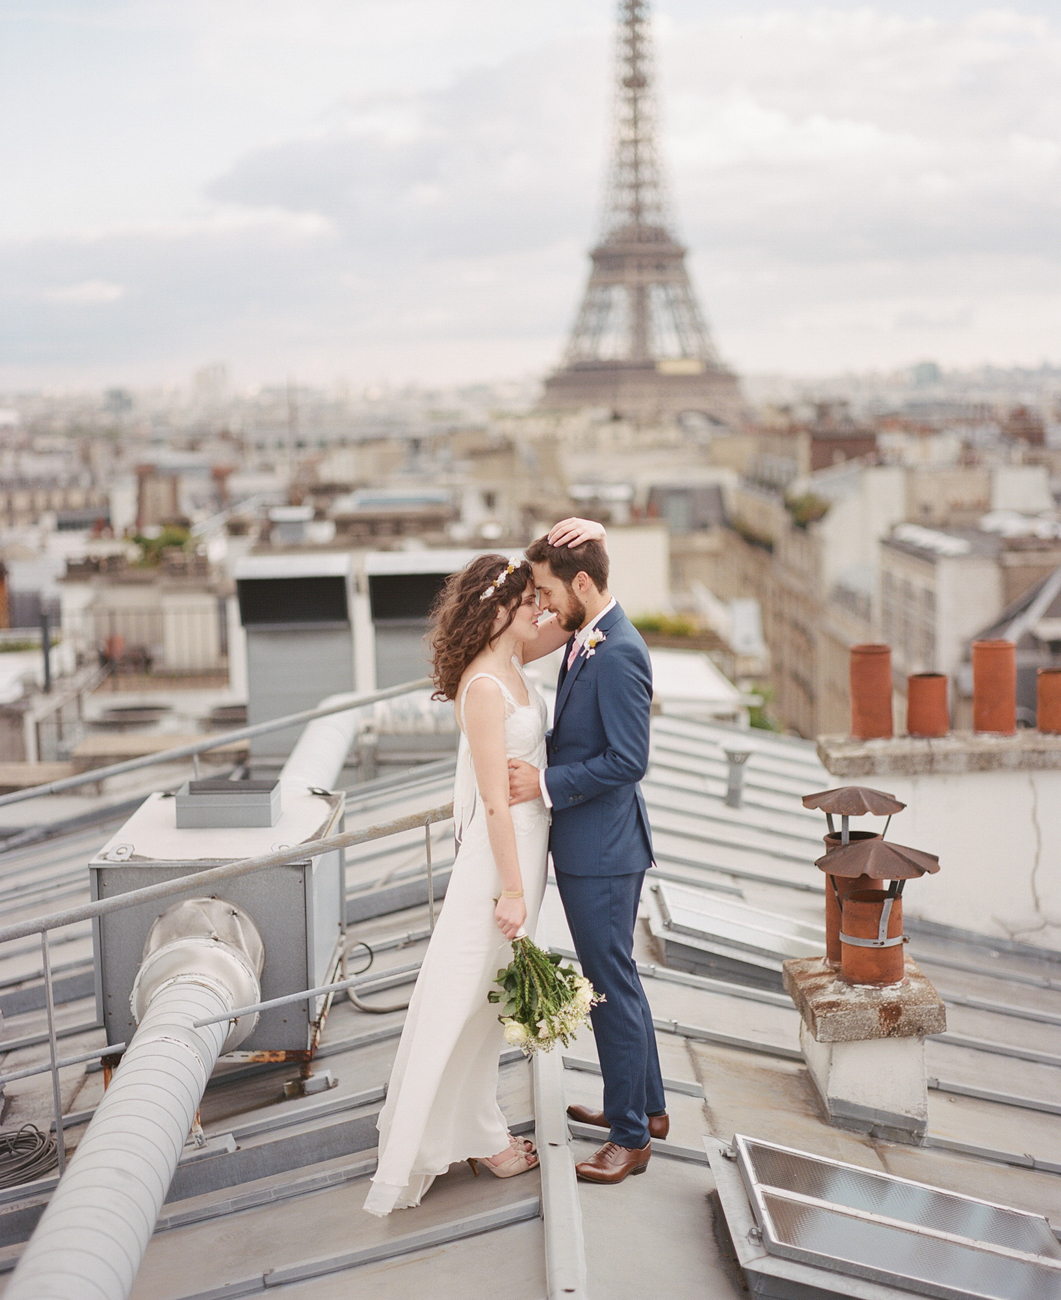 toits-paris-mariage-photographe-2.jpg